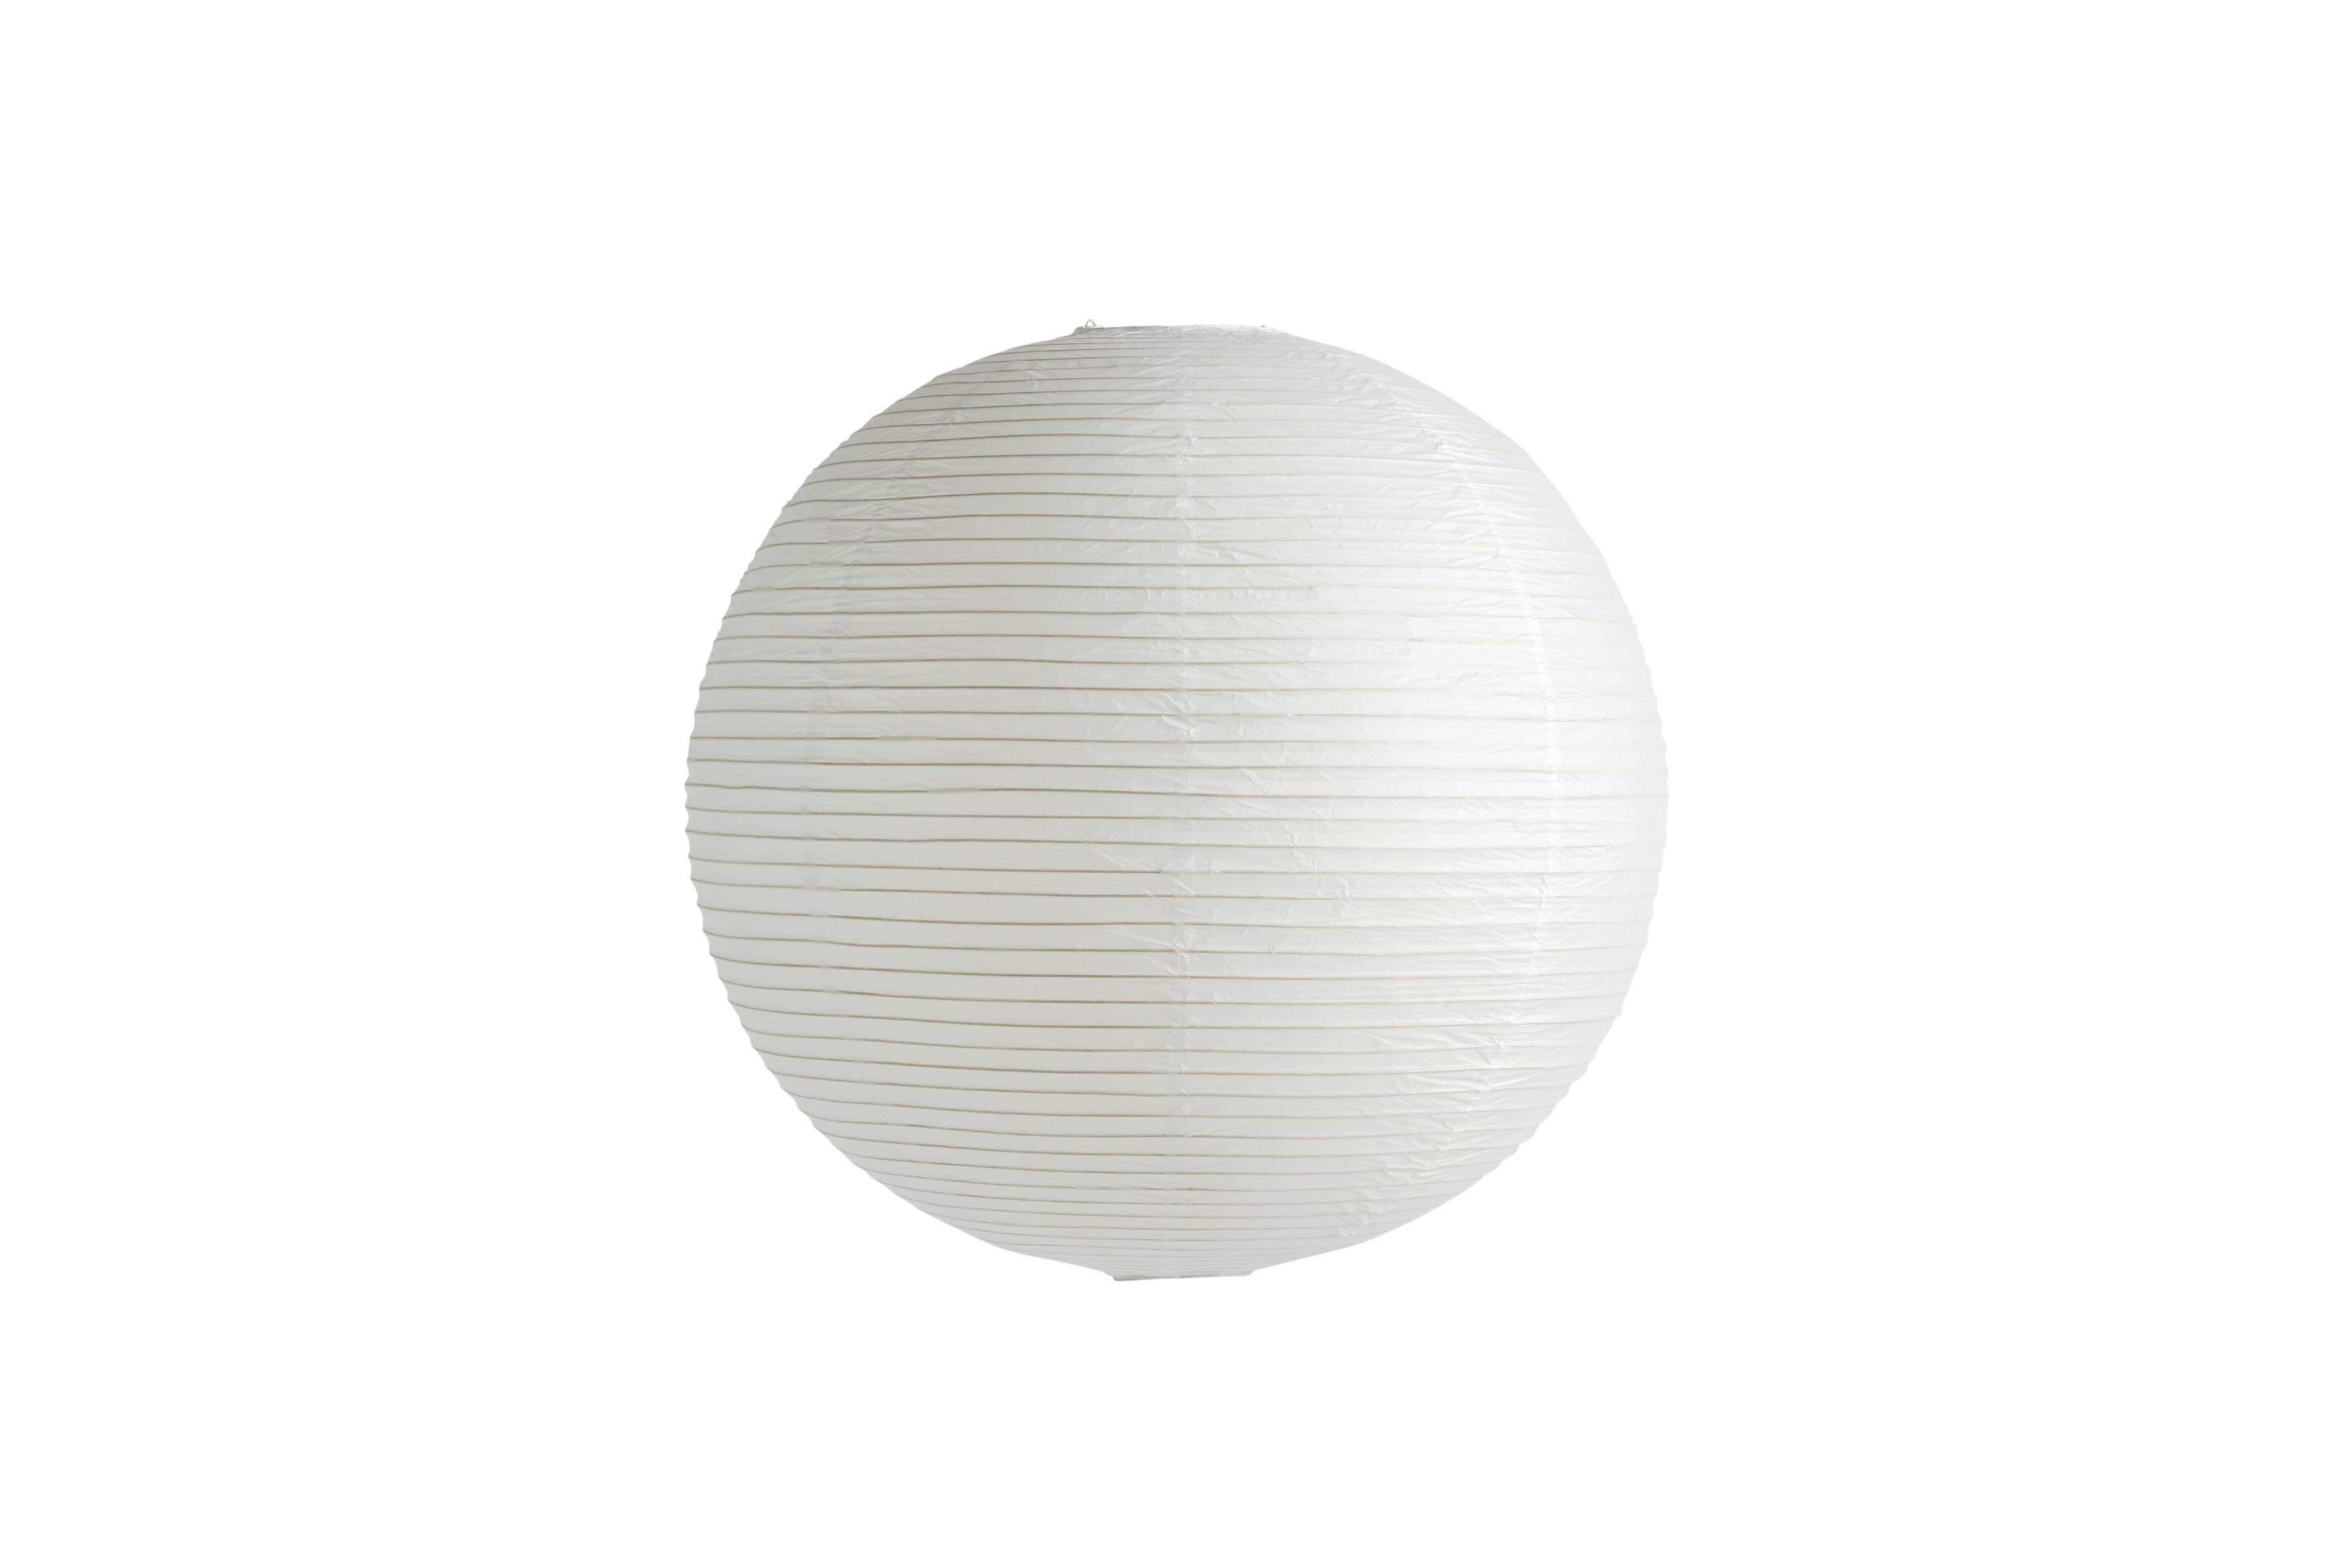 HAY Classic rispapir lampeskærm, Ø60 cm, hvid